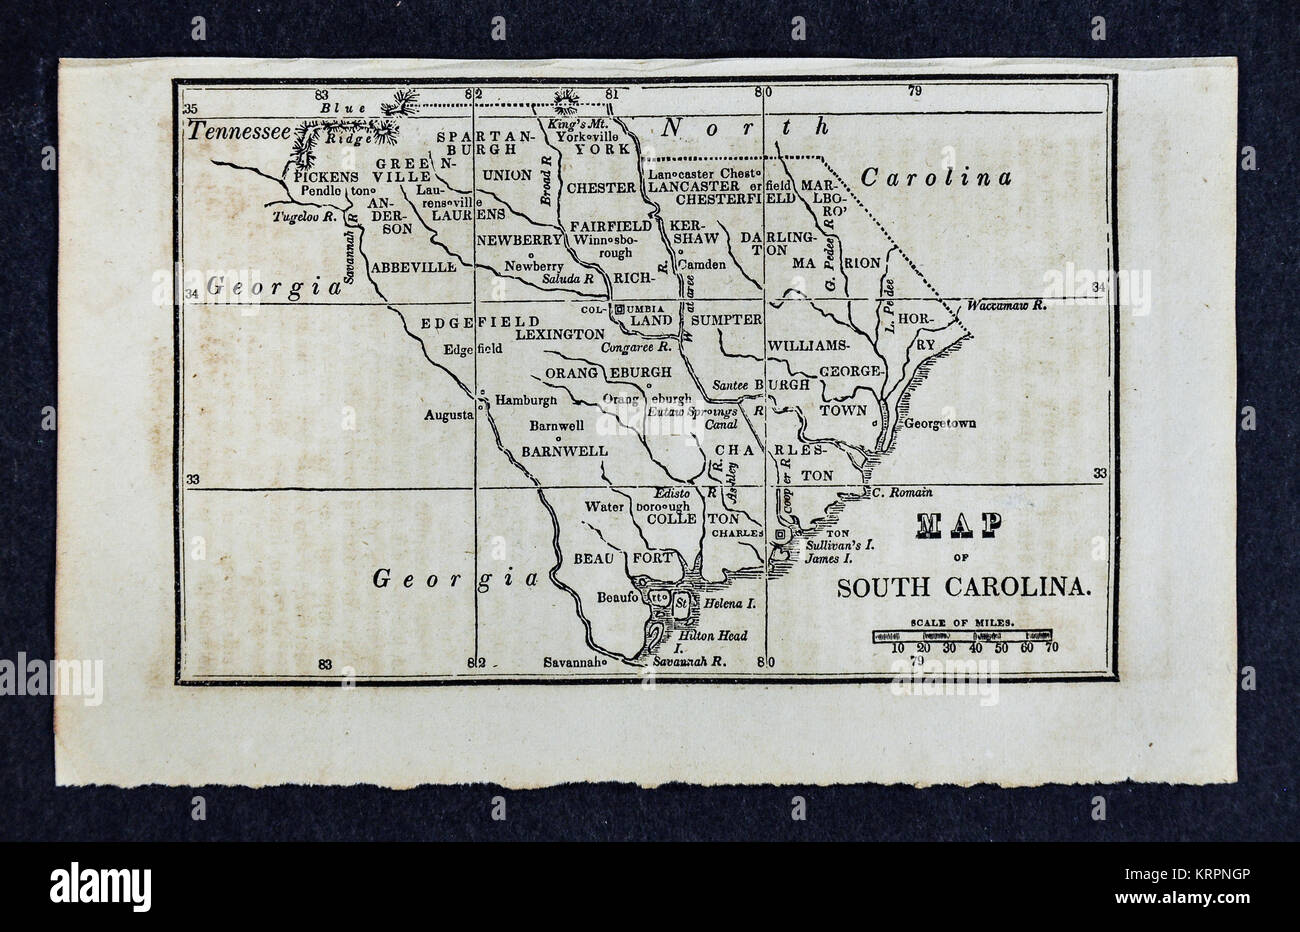 Vintage South Carolina Map.Vintage South Carolina Map Stock Photos Vintage South Carolina Map